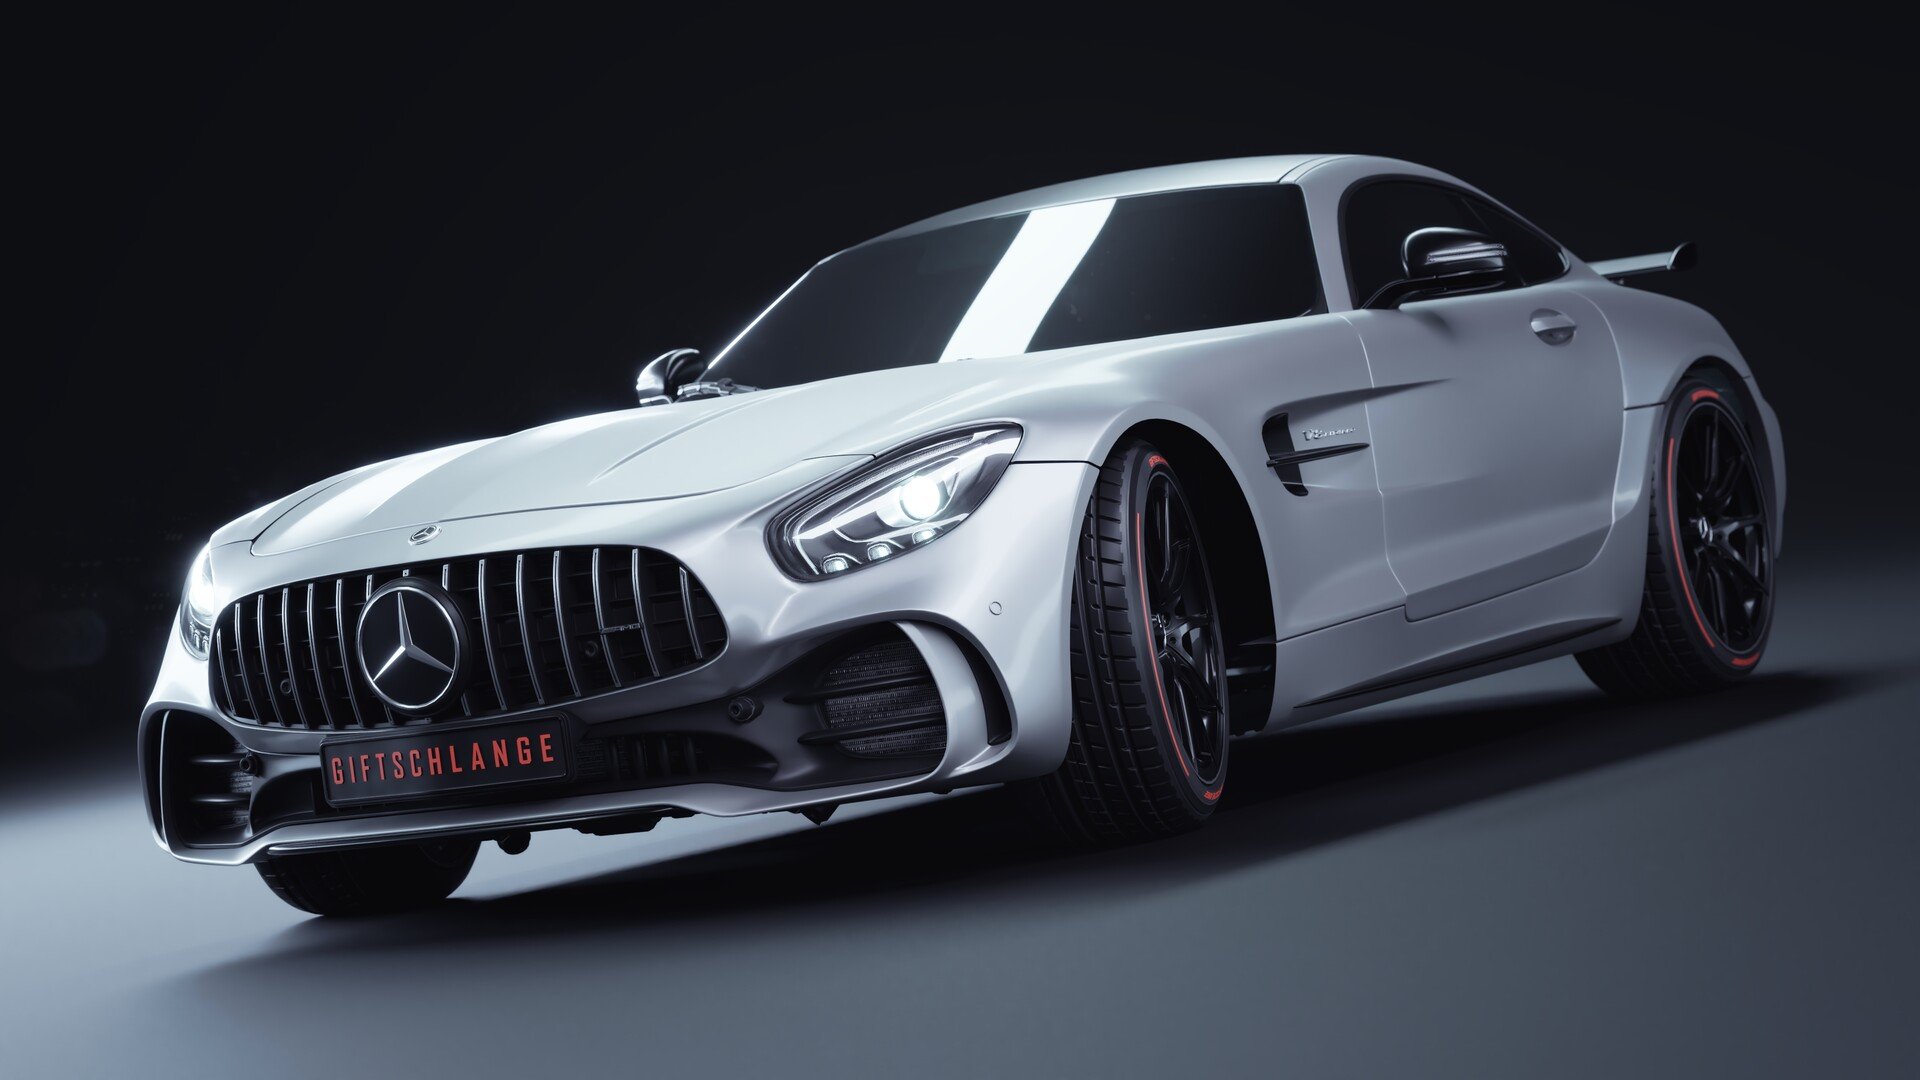 Mercedes-AMG GT Roadster ( Sports car )